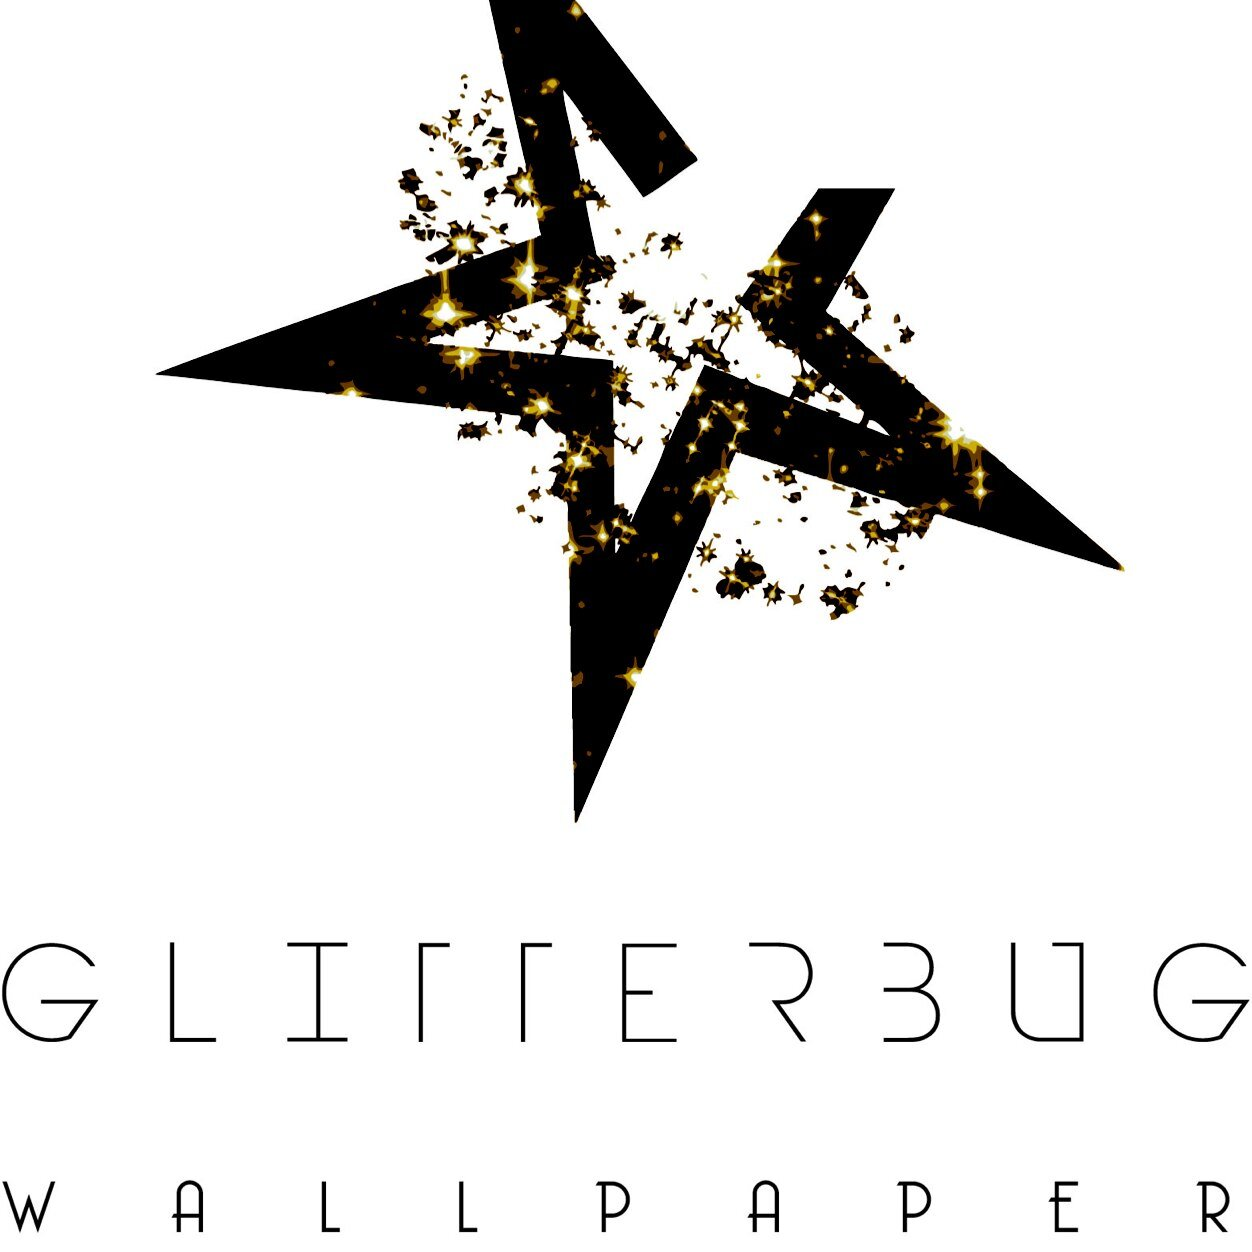 GlitterBug Wallpaper